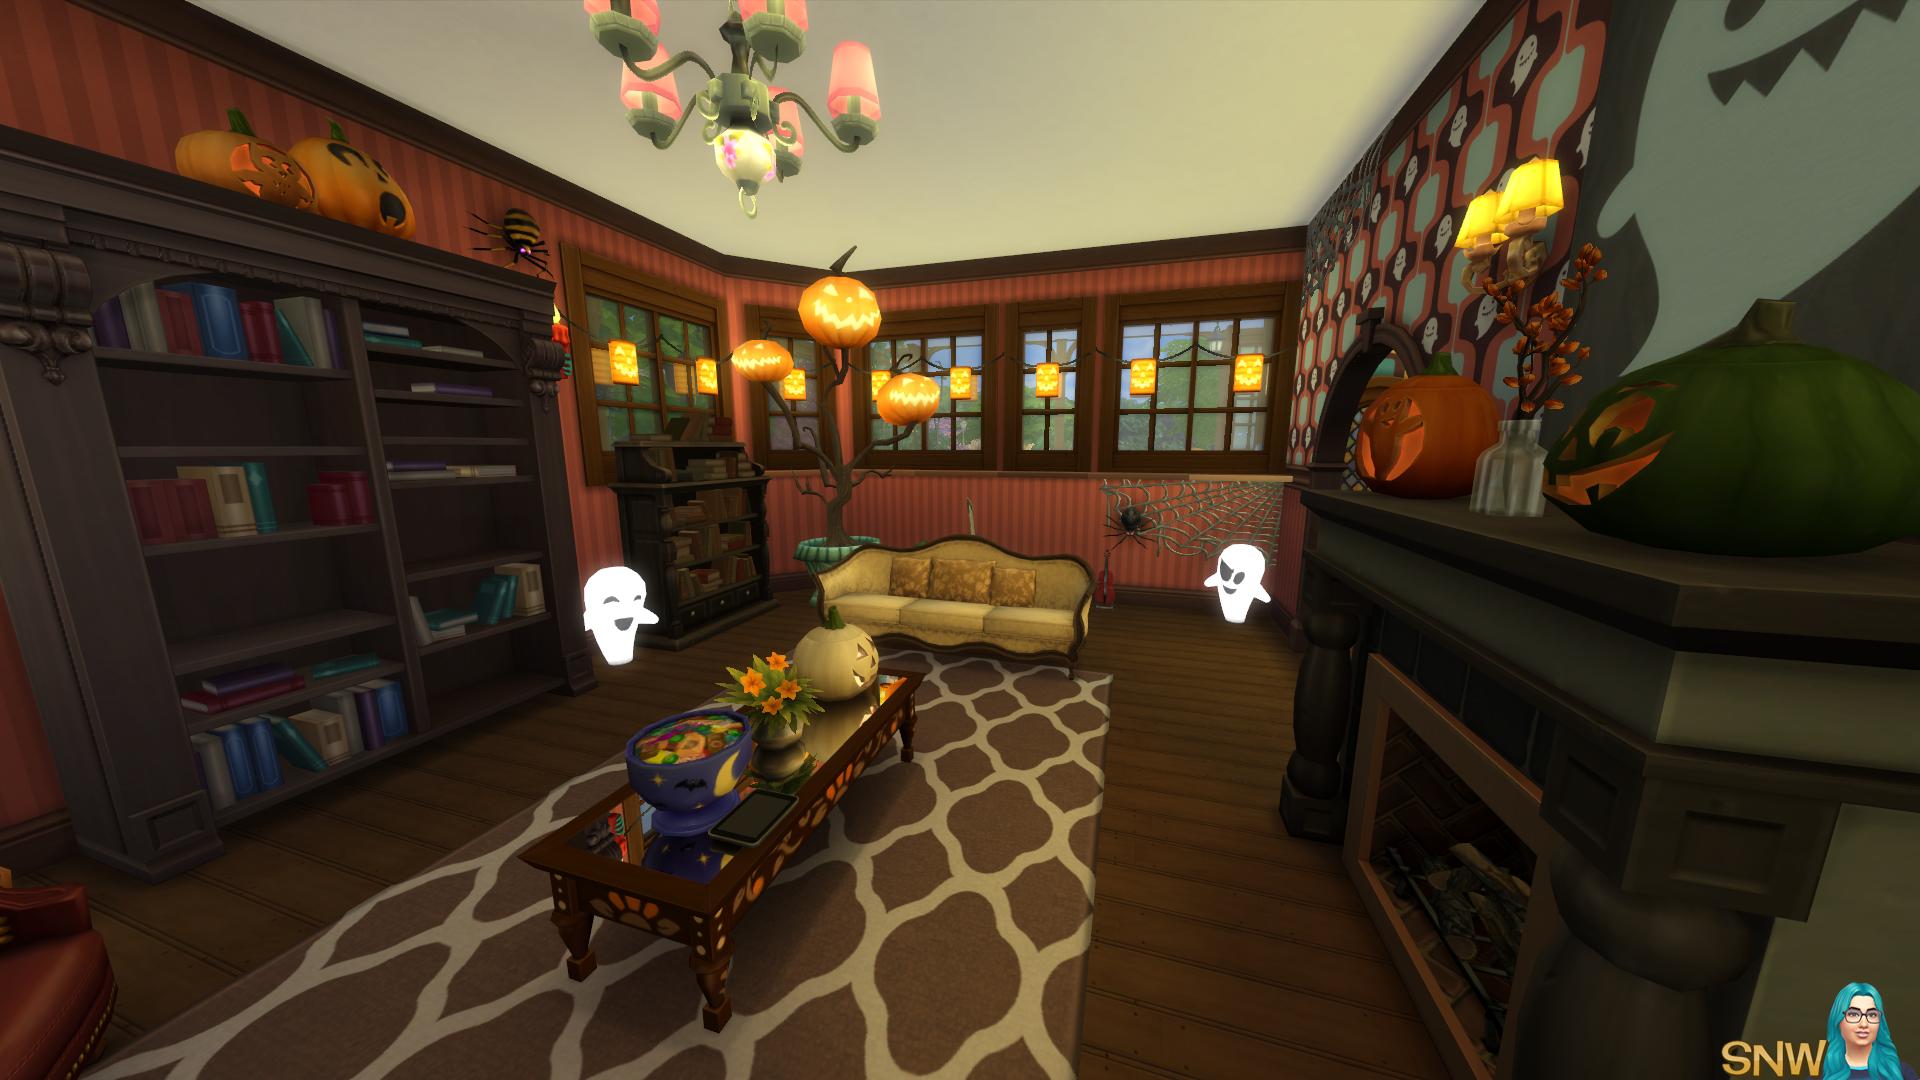 Spooky & Cute Victorian Huis